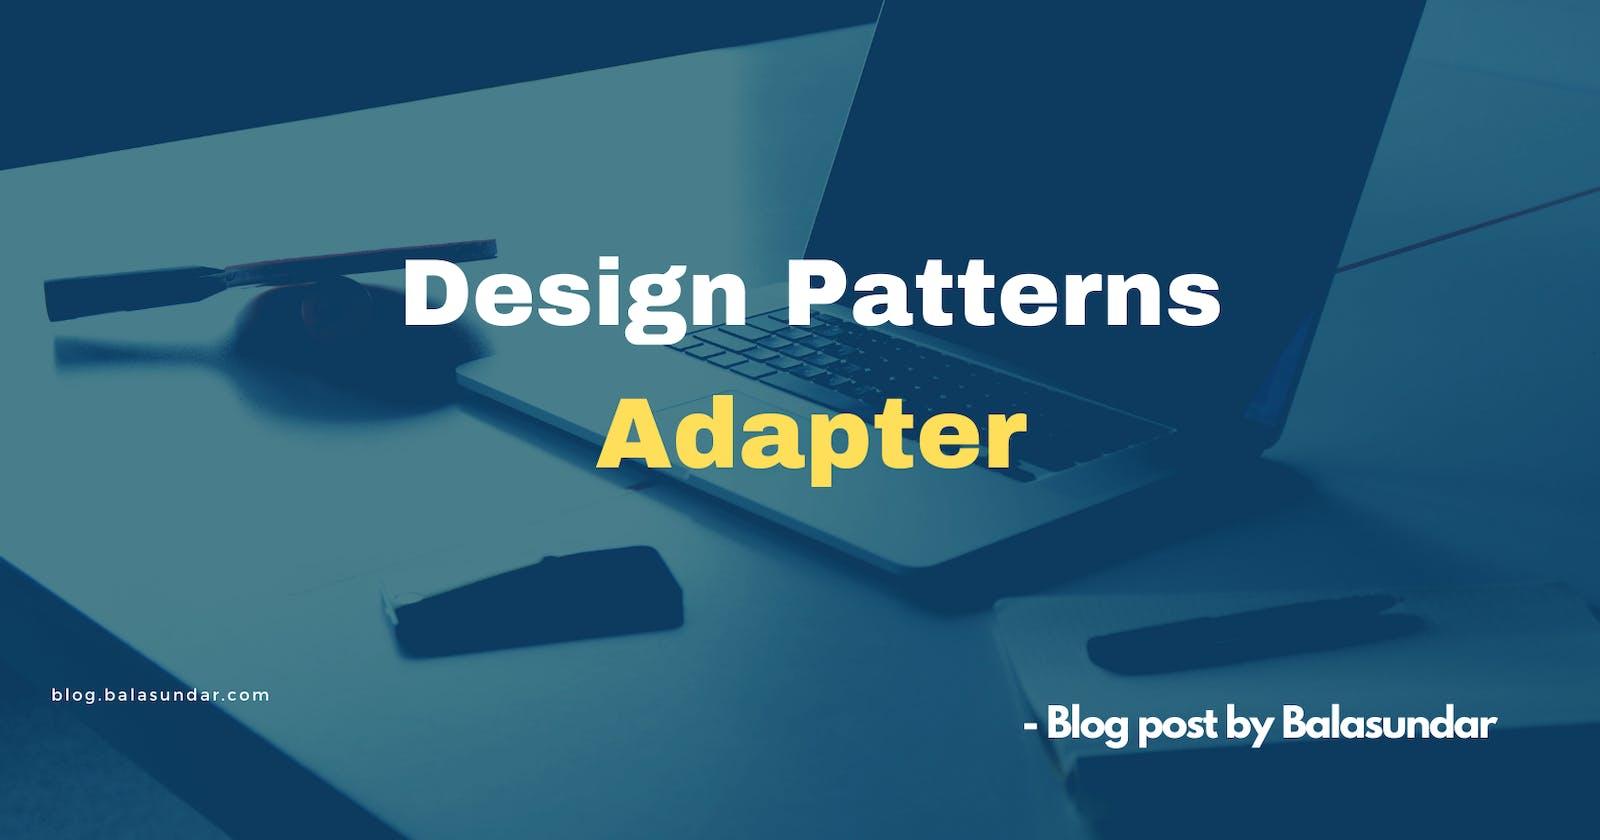 Design Patterns - Adapter